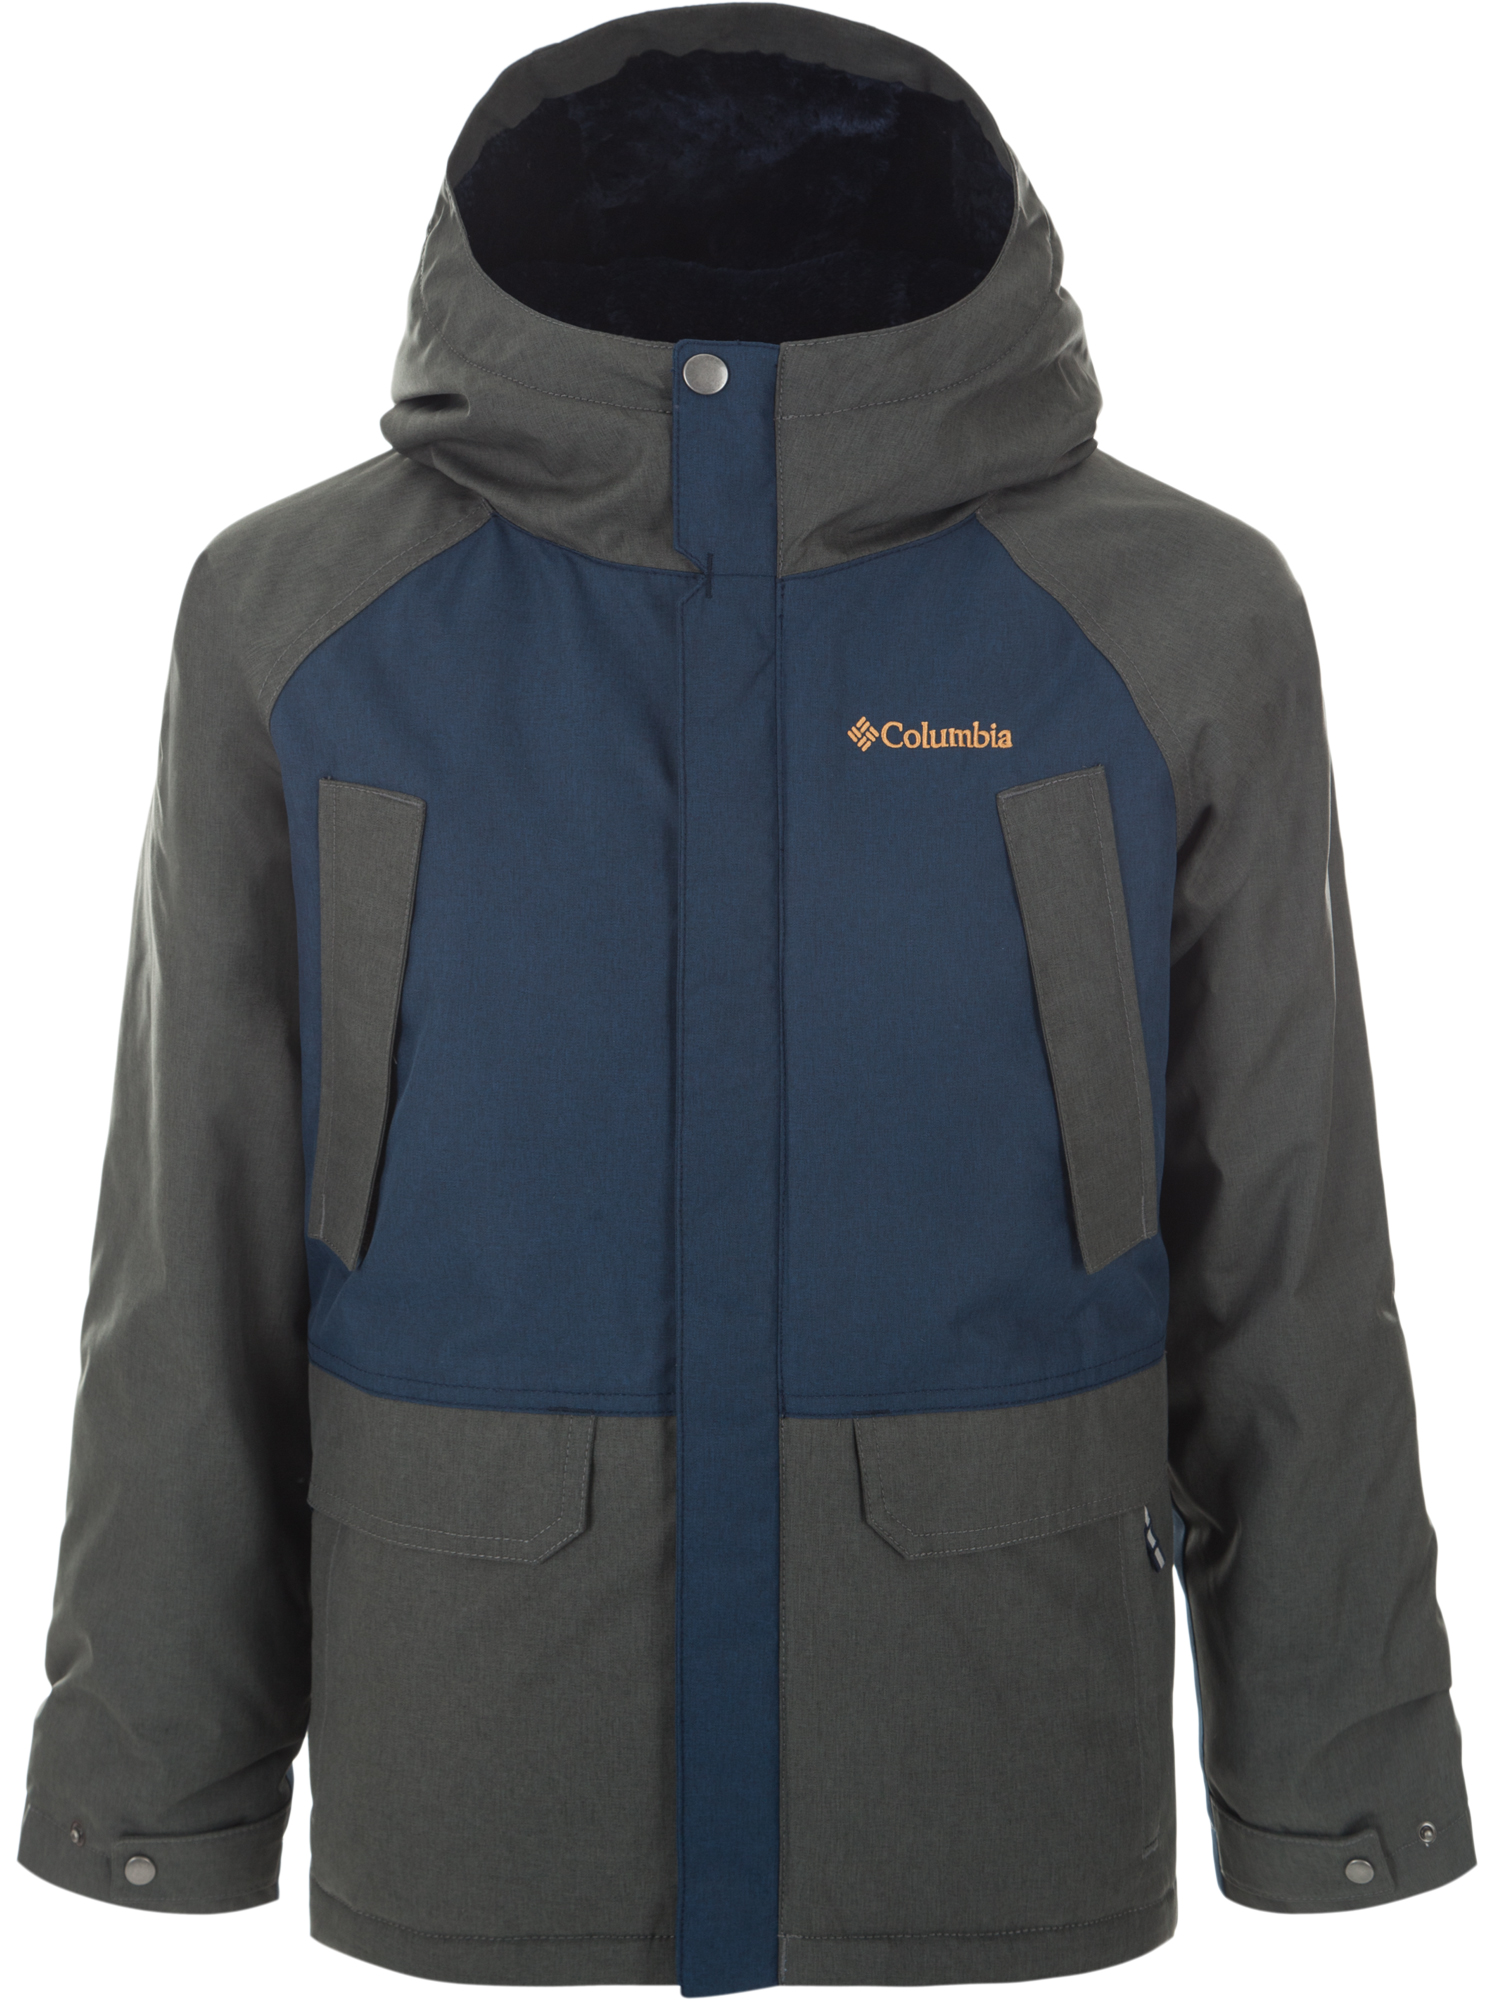 Columbia Куртка утепленная для мальчиков Columbia Timberlake Lodge, размер 160-170 justin timberlake justin timberlake 20 20 experience